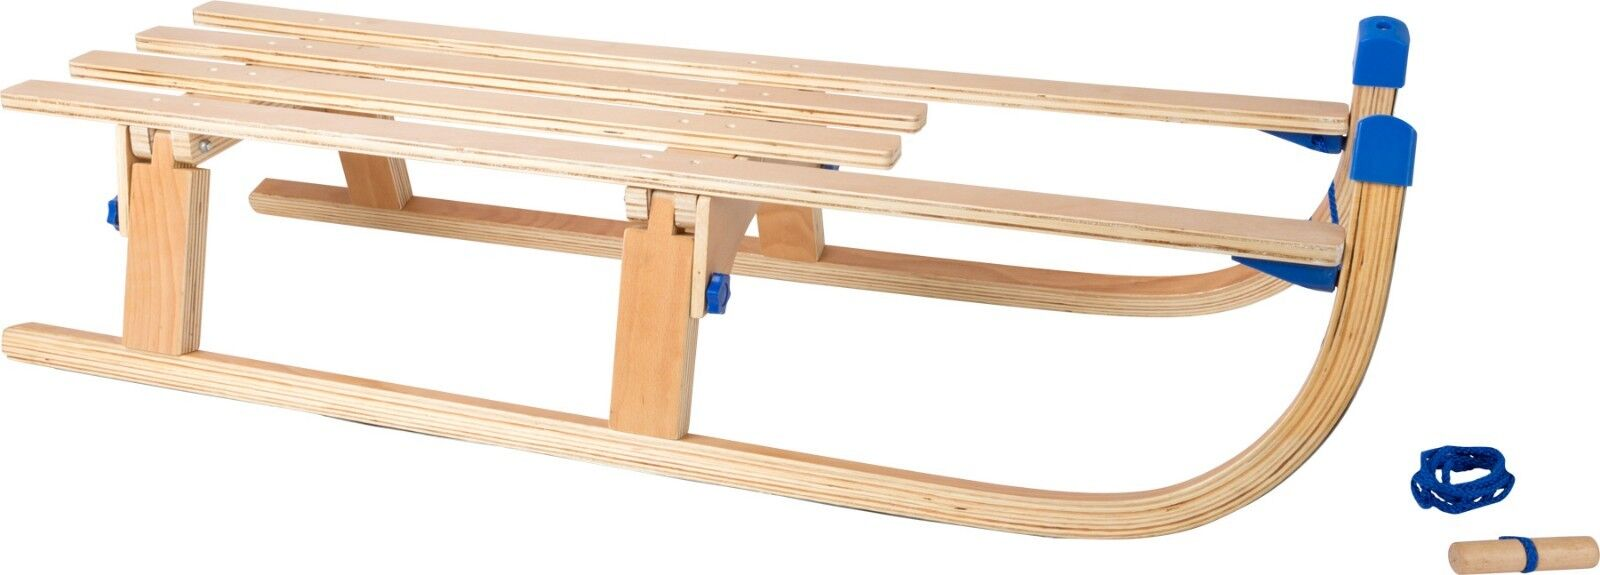 Klappschlitten Schlitten Holz ca. 109 x 32 x 23 cm Sitzhöhe 20 cm